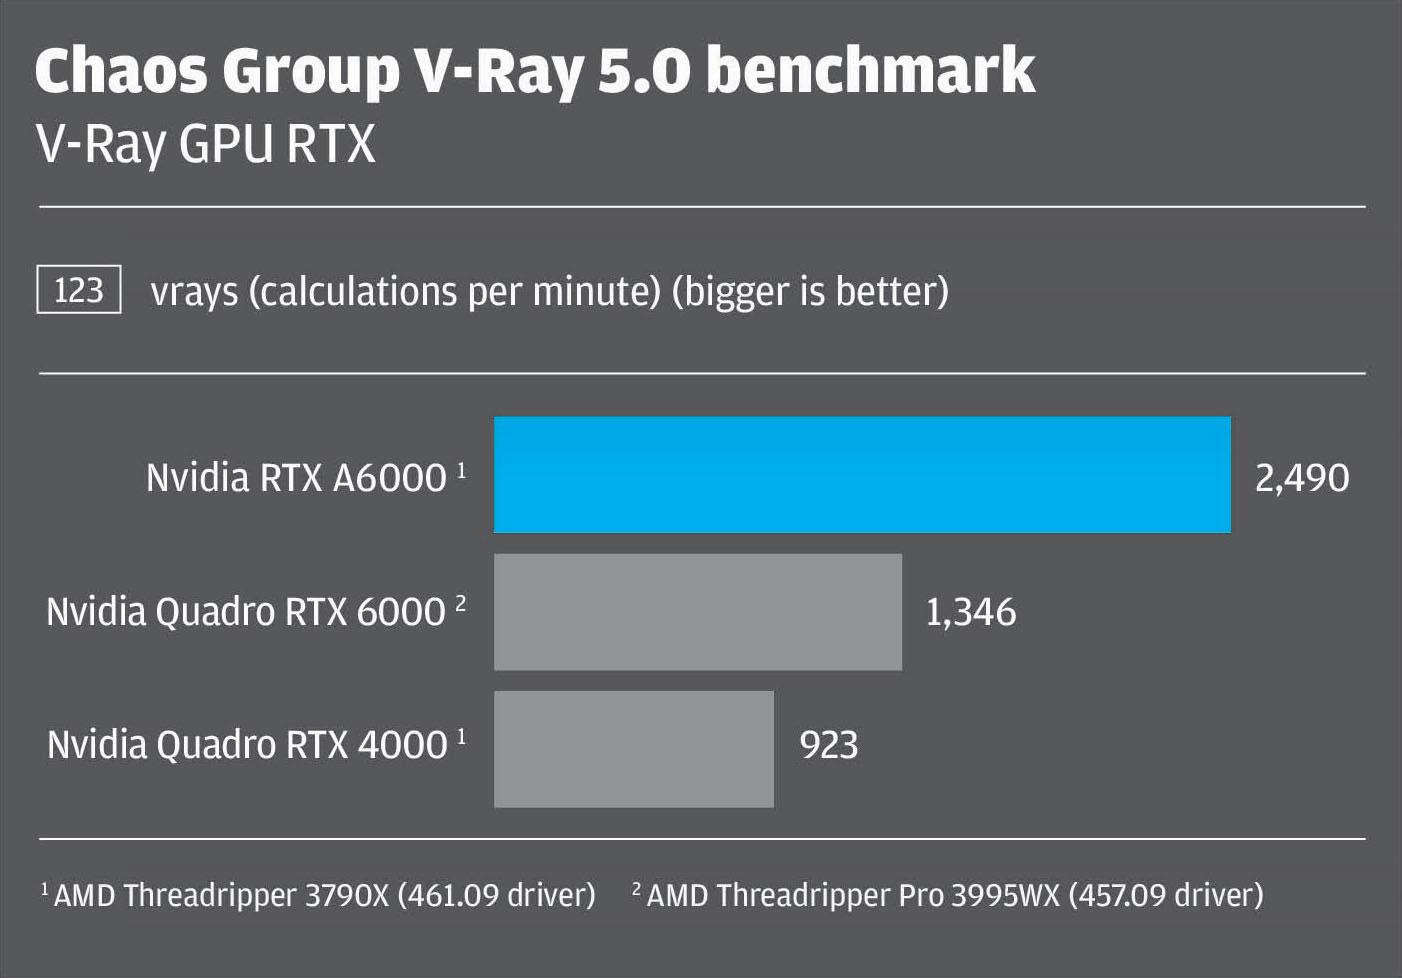 Vray 5.0 GPU RTX Nvidia RTX A6000